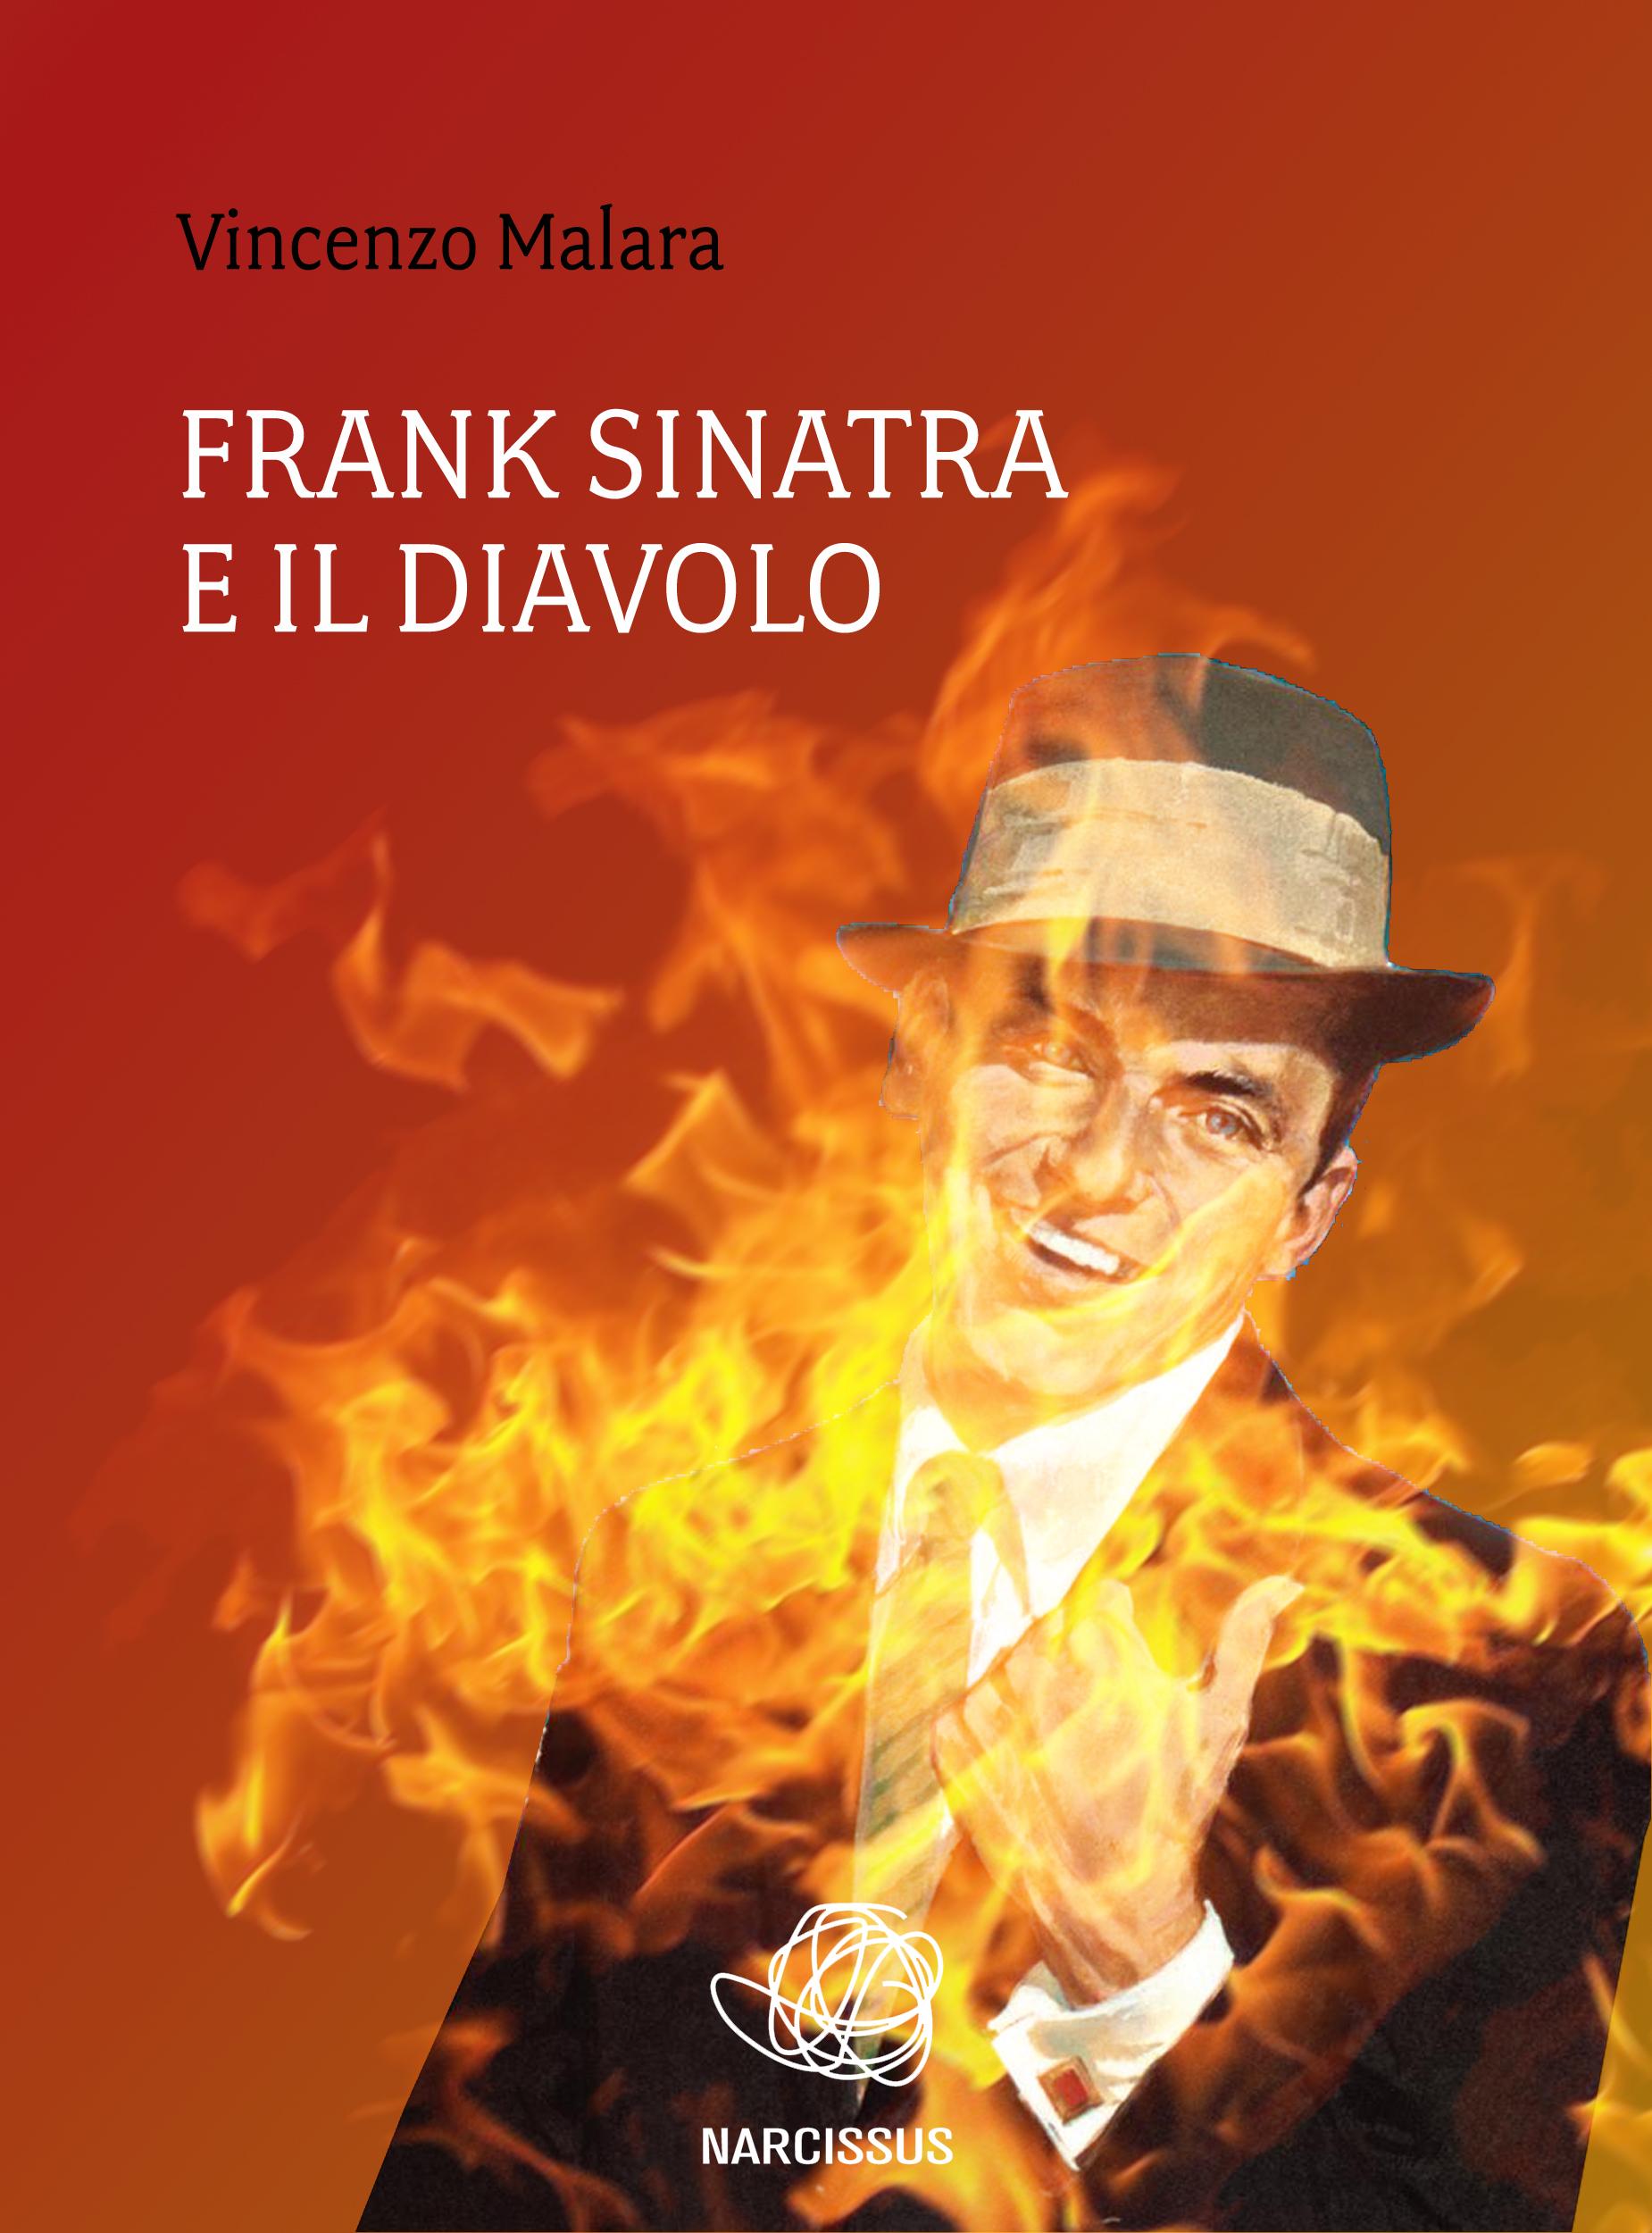 Frank Sinatra grande pene